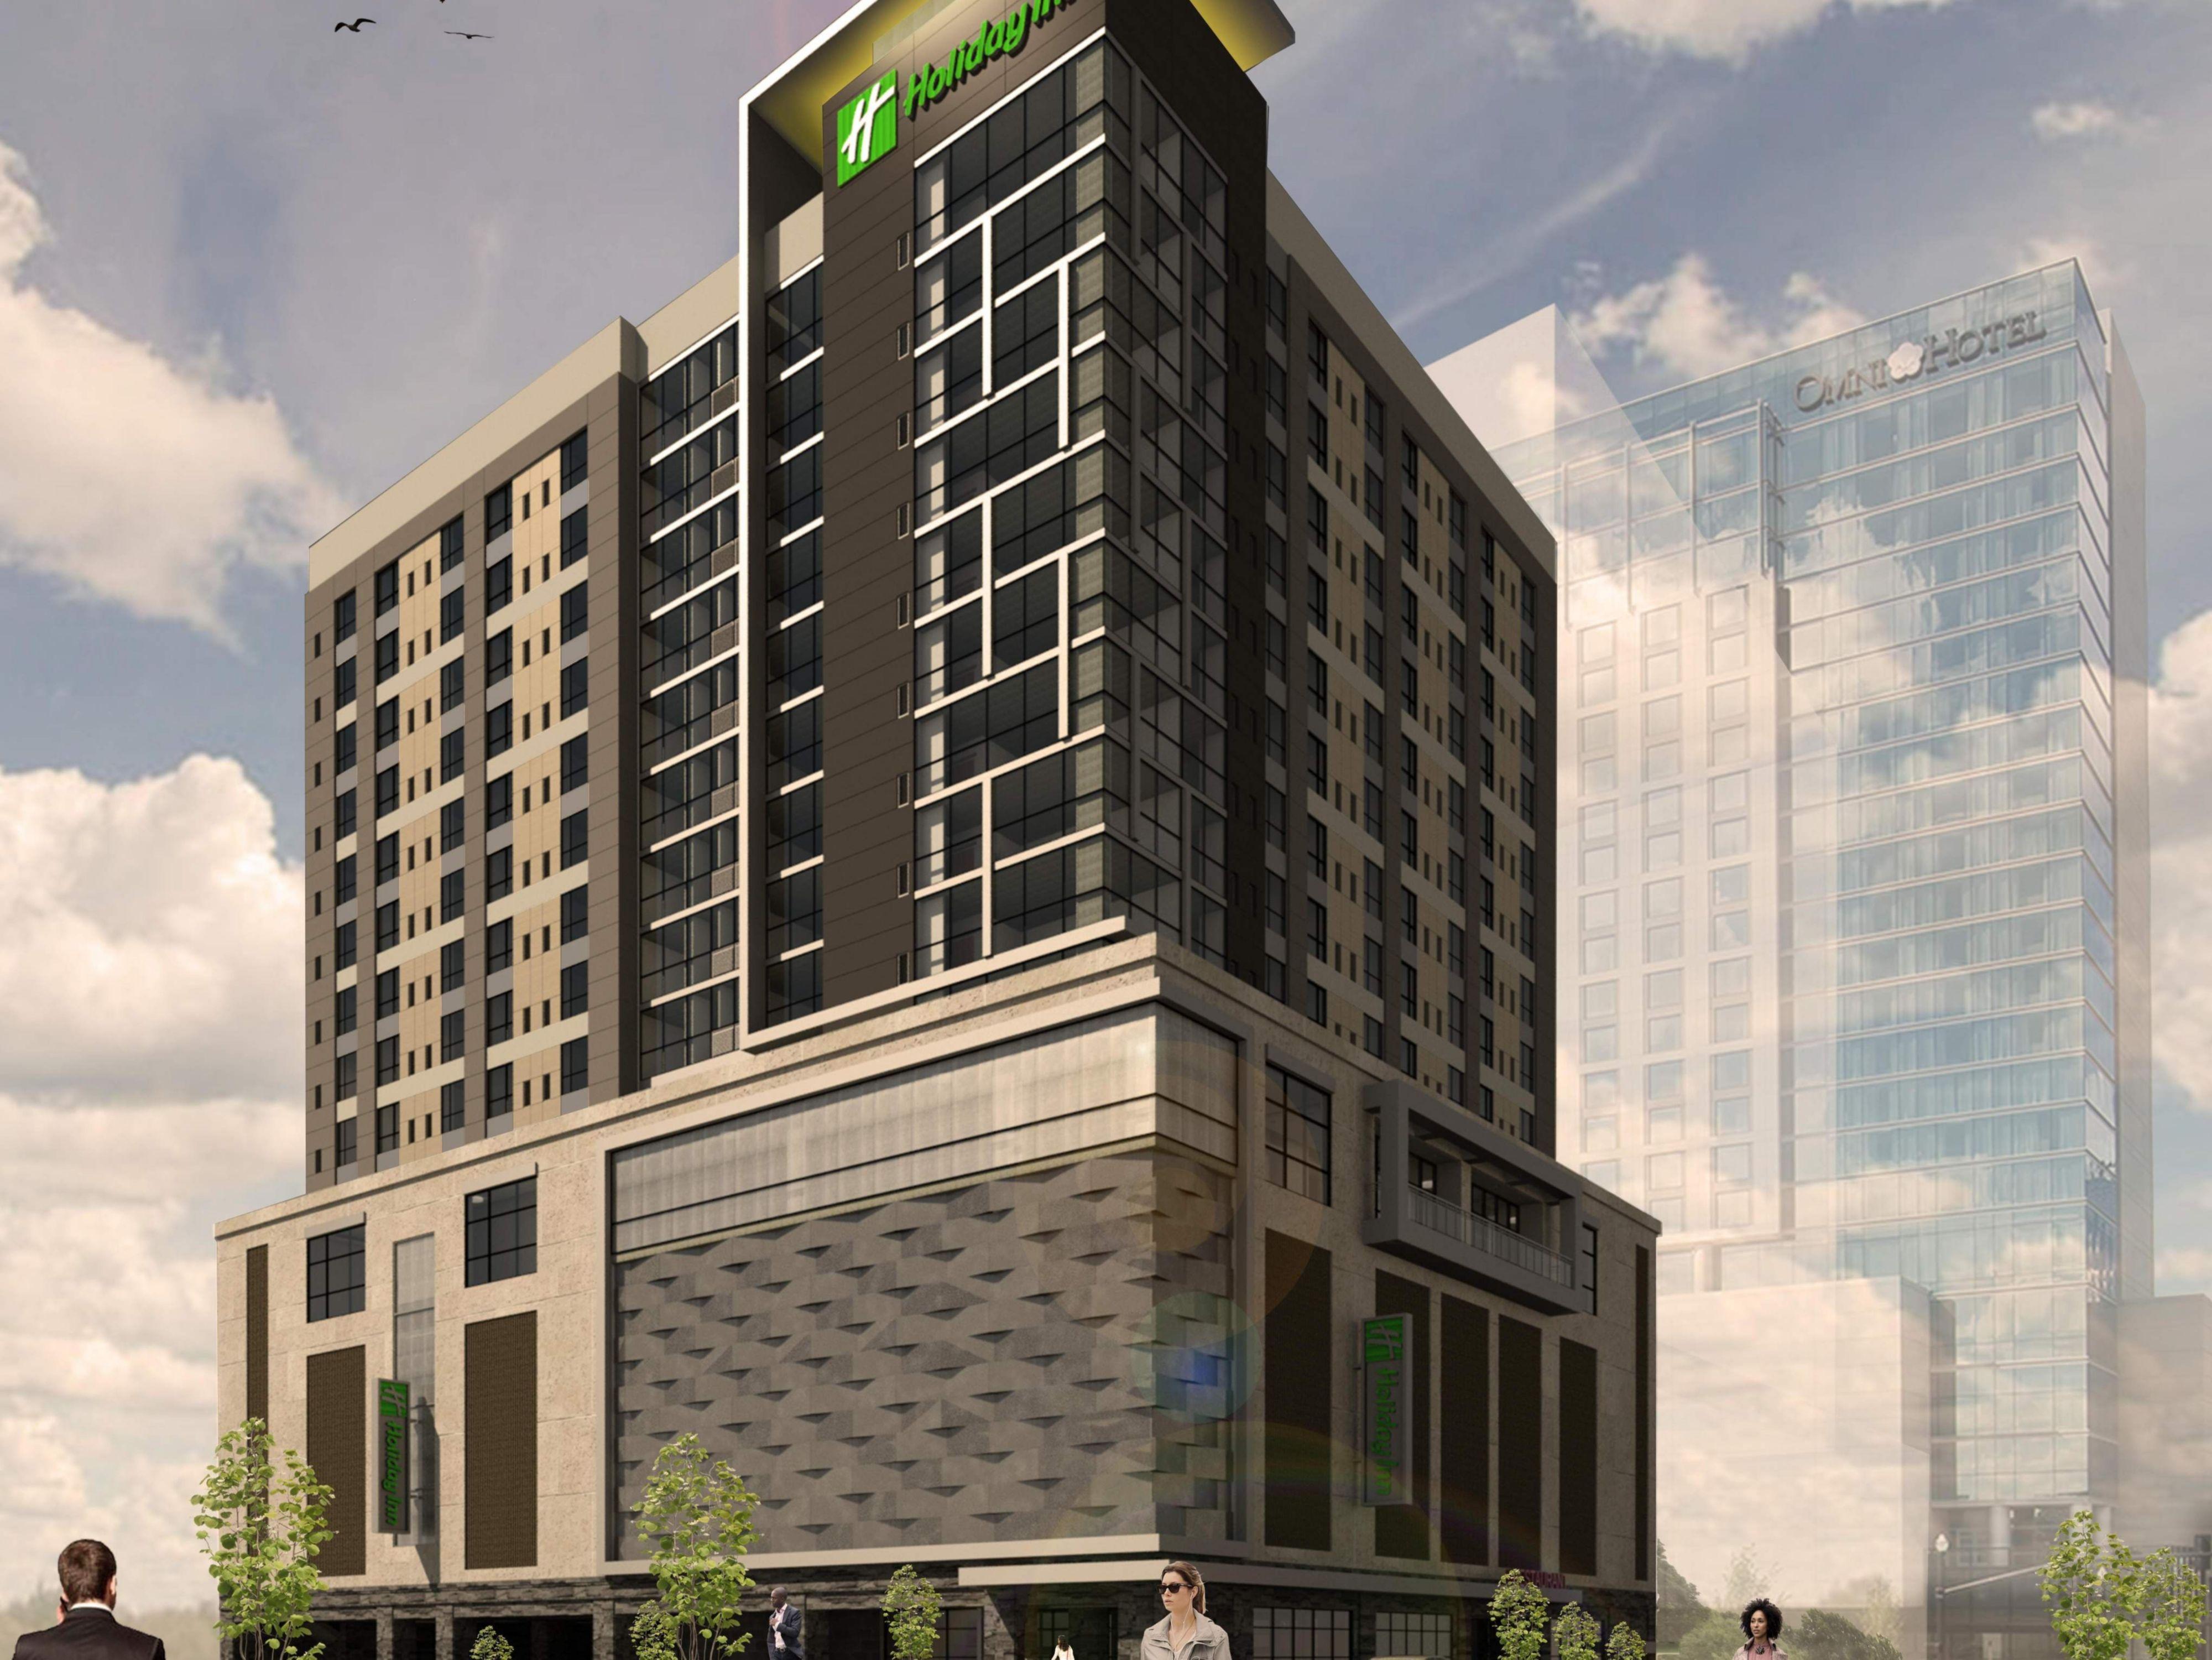 Downtown nashville tn hotel holiday inn nashville downtown 37210 for Hotel suites nashville tn 2 bedroom